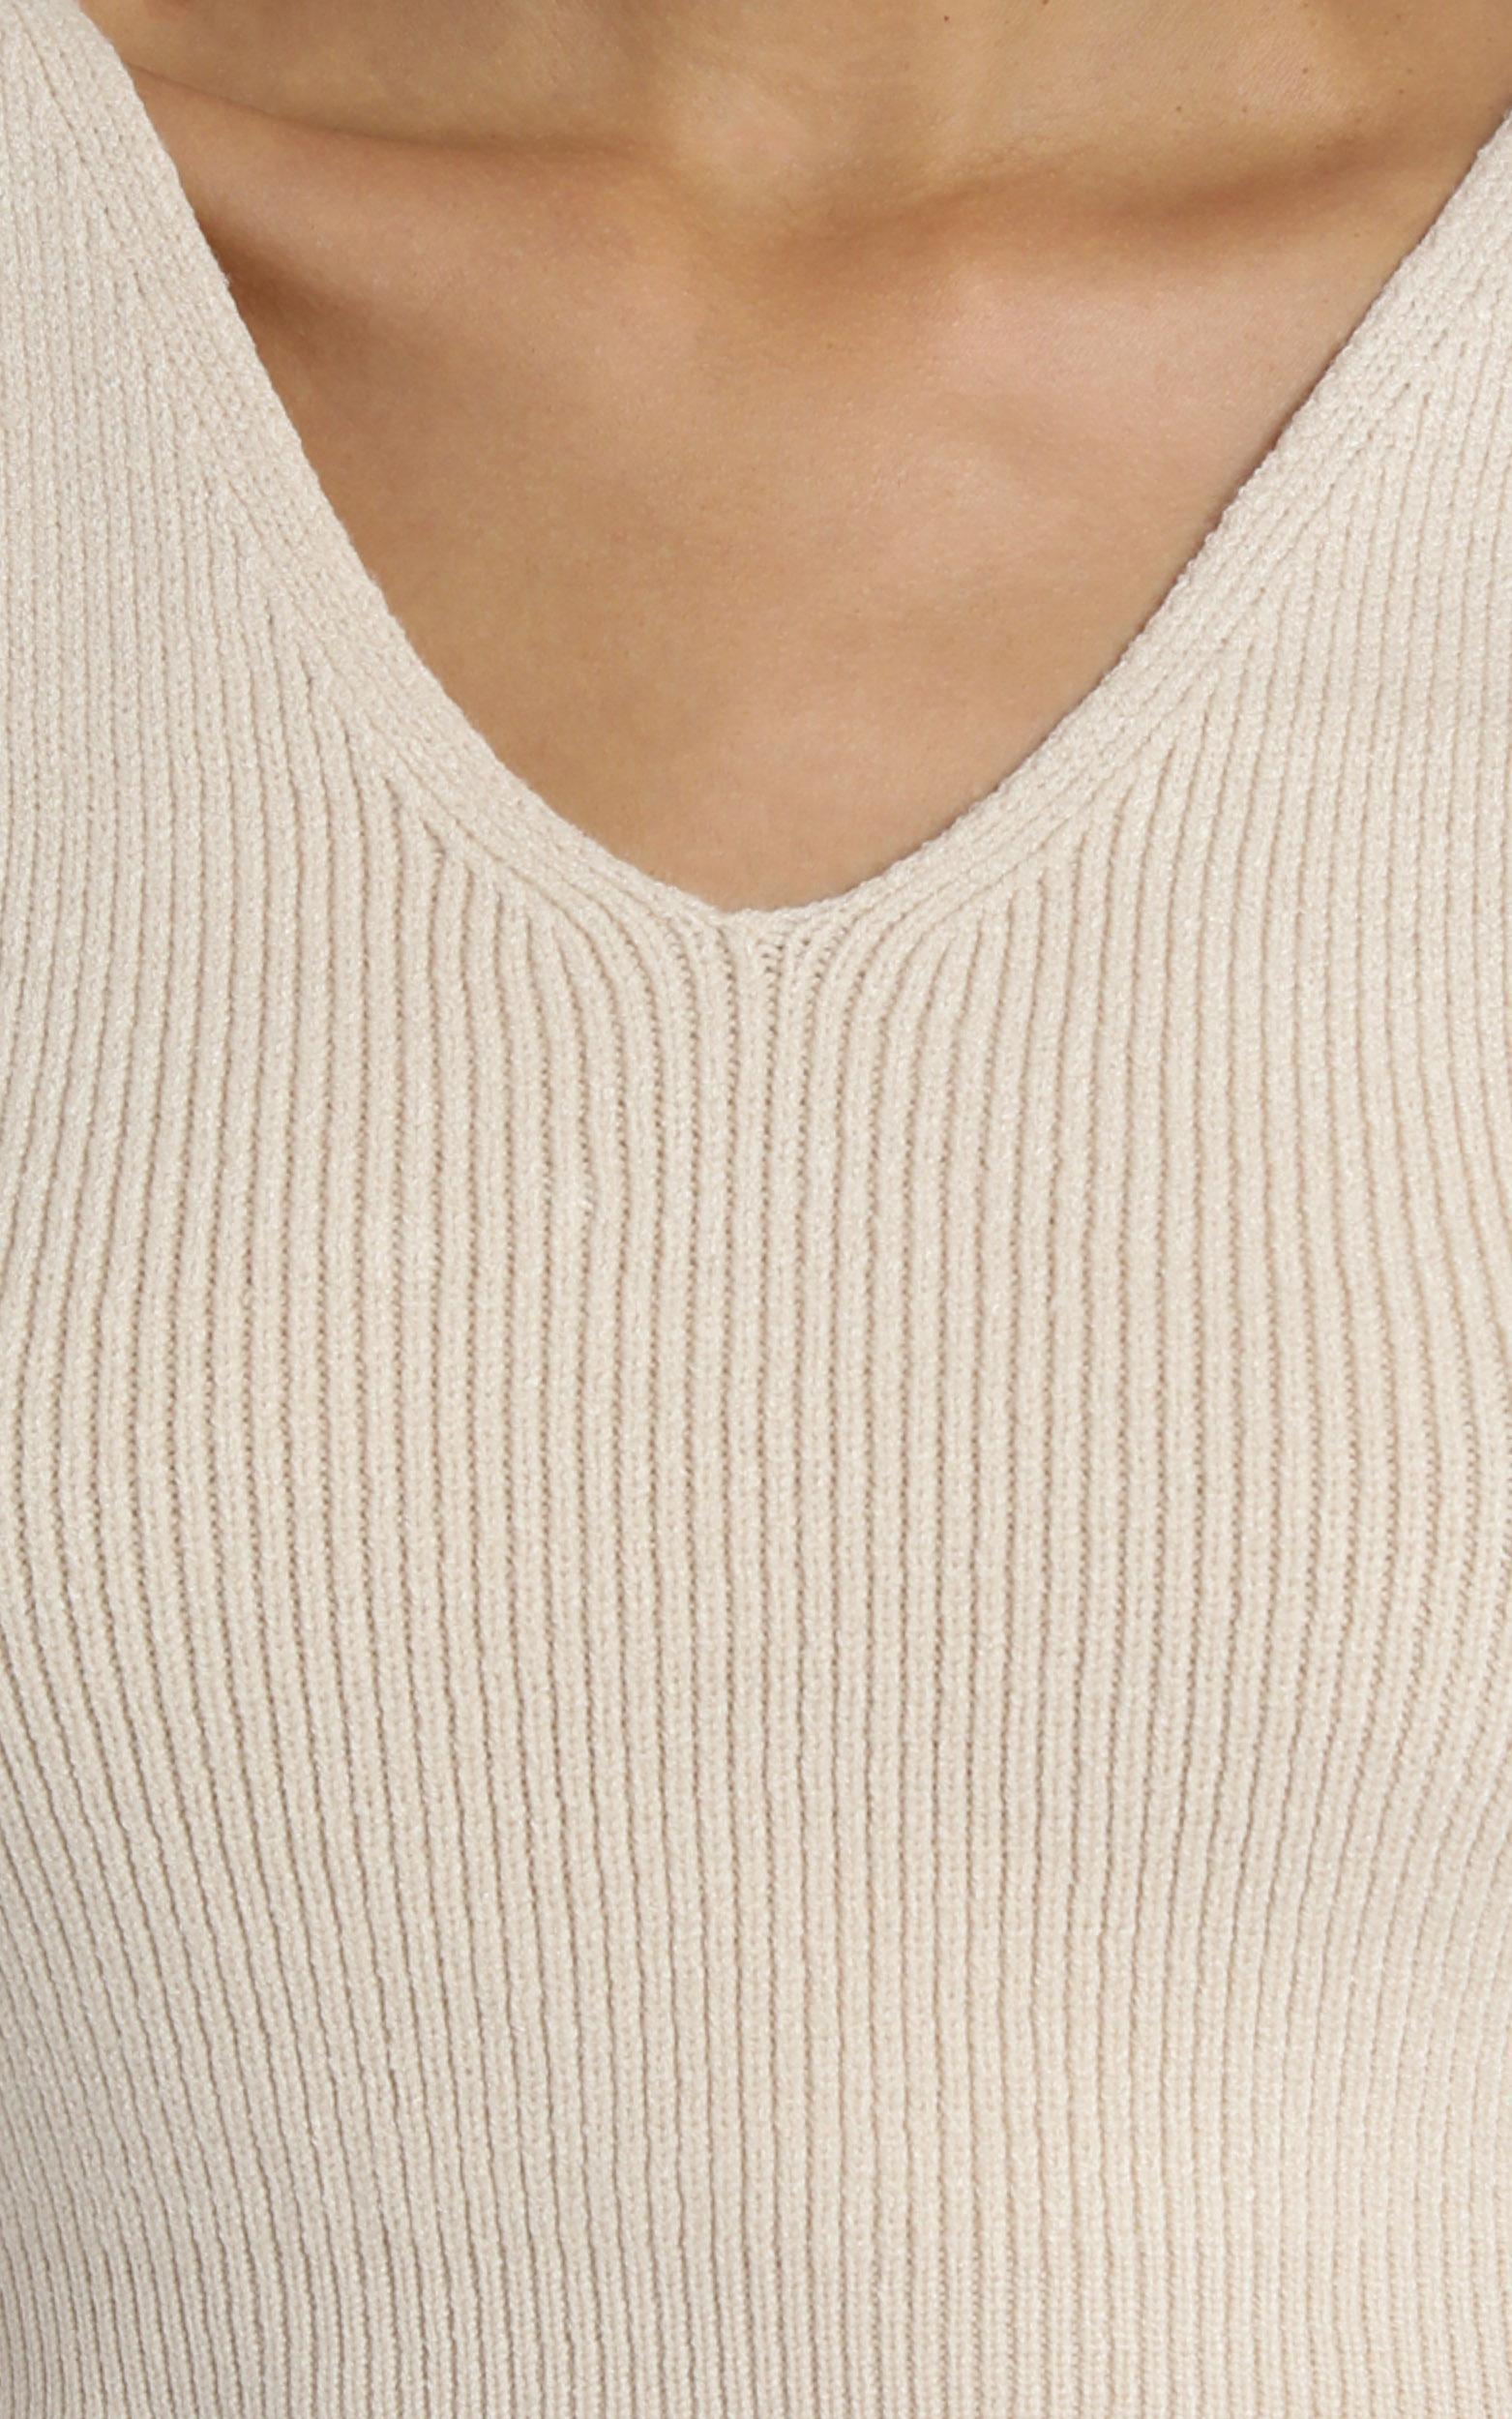 Yana Knit Top in Beige - 8 (S), Beige, hi-res image number null